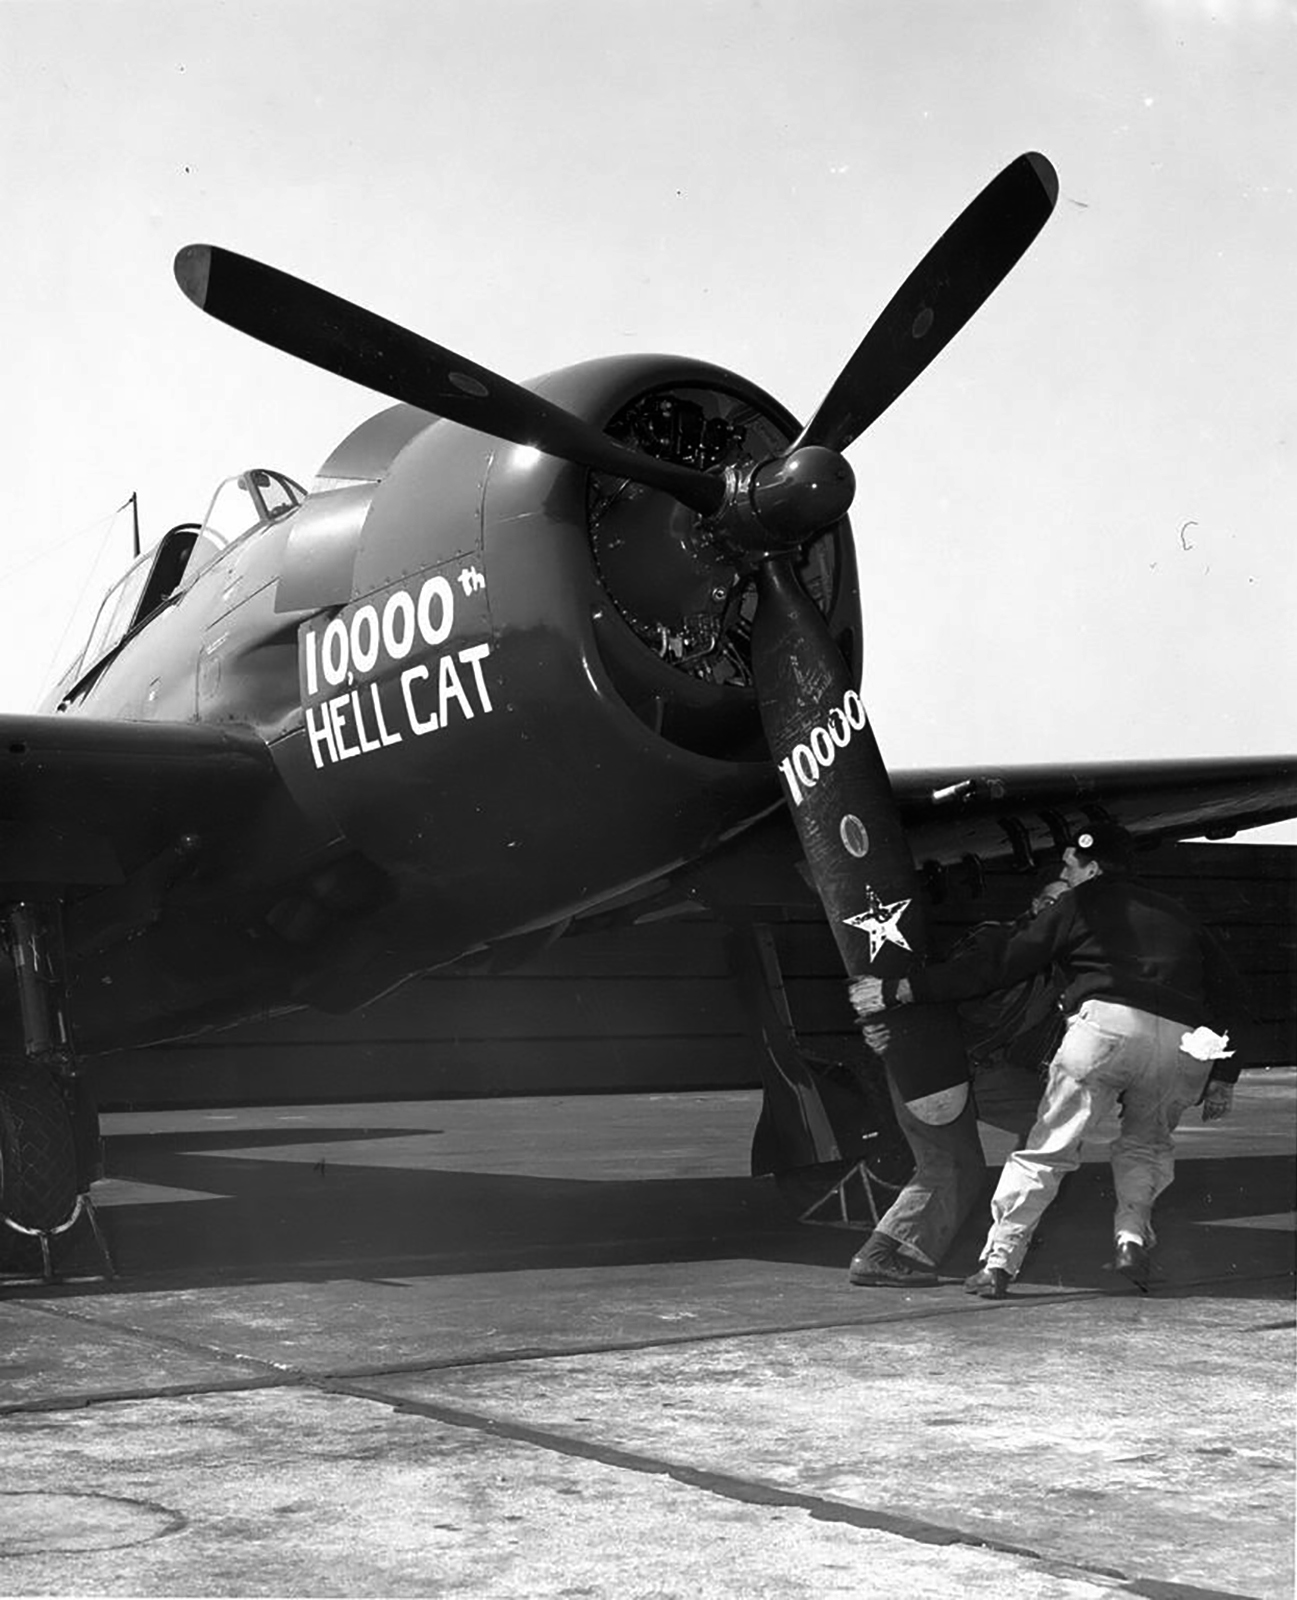 Grumman F6F 5 Hellcat VBF 87 White 76 named 10,000th Hellcat CV 14 USS Ticonderoga June 1945 03